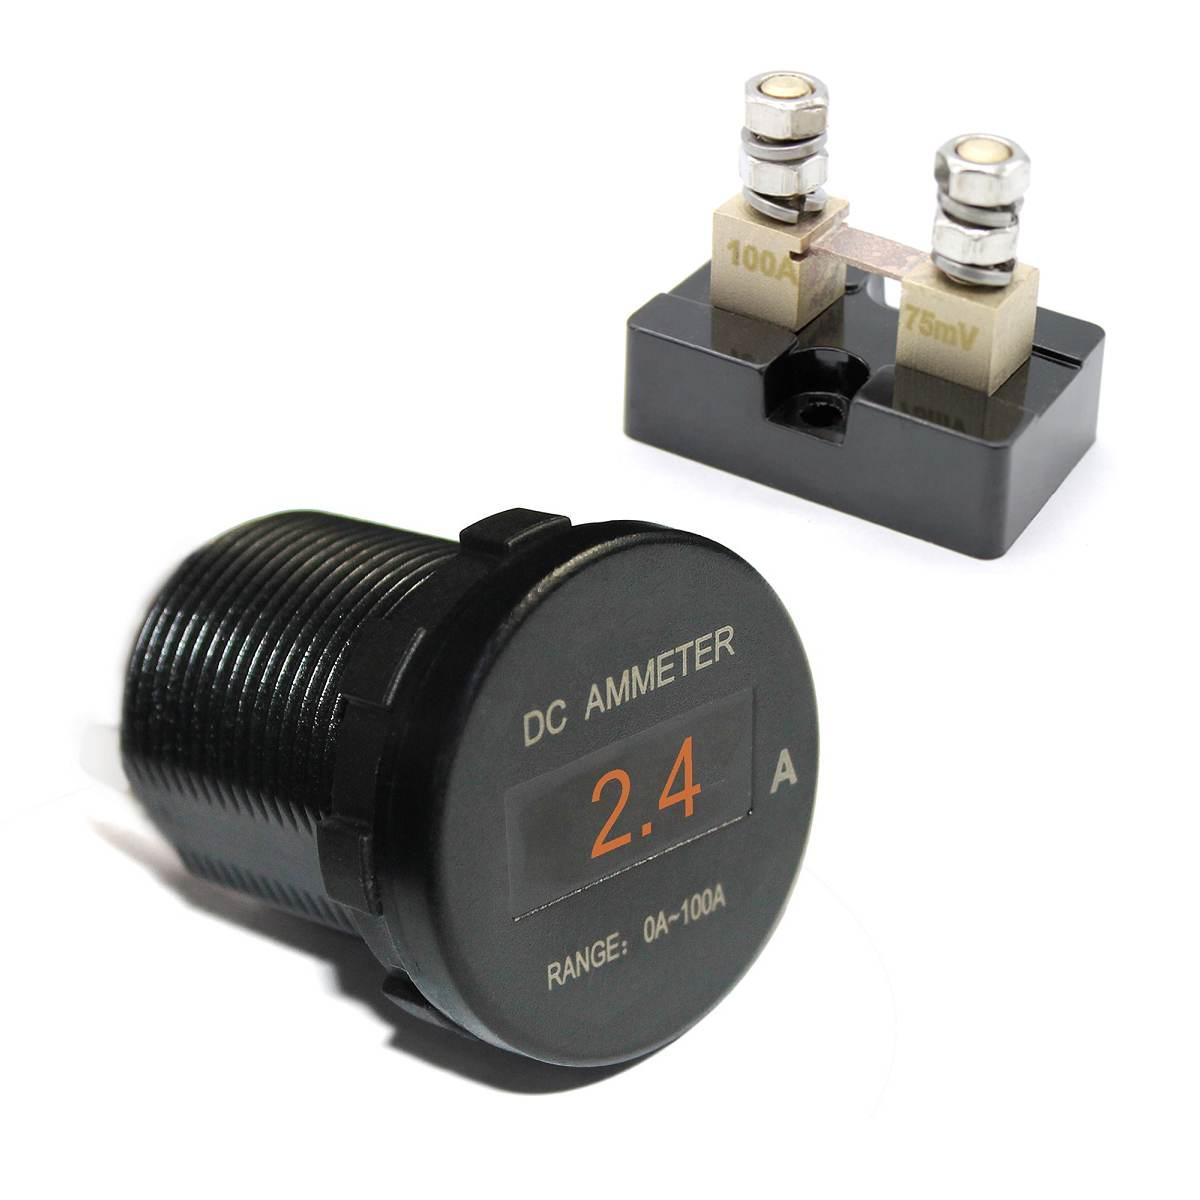 GemäßIgt Universal Auto Boot Marine Mini Digital Oled Dc Amperemeter Monitor Strom Amp Meter 12 V/24 V 5 Farbe Bildschirm Wasserdicht Ip66